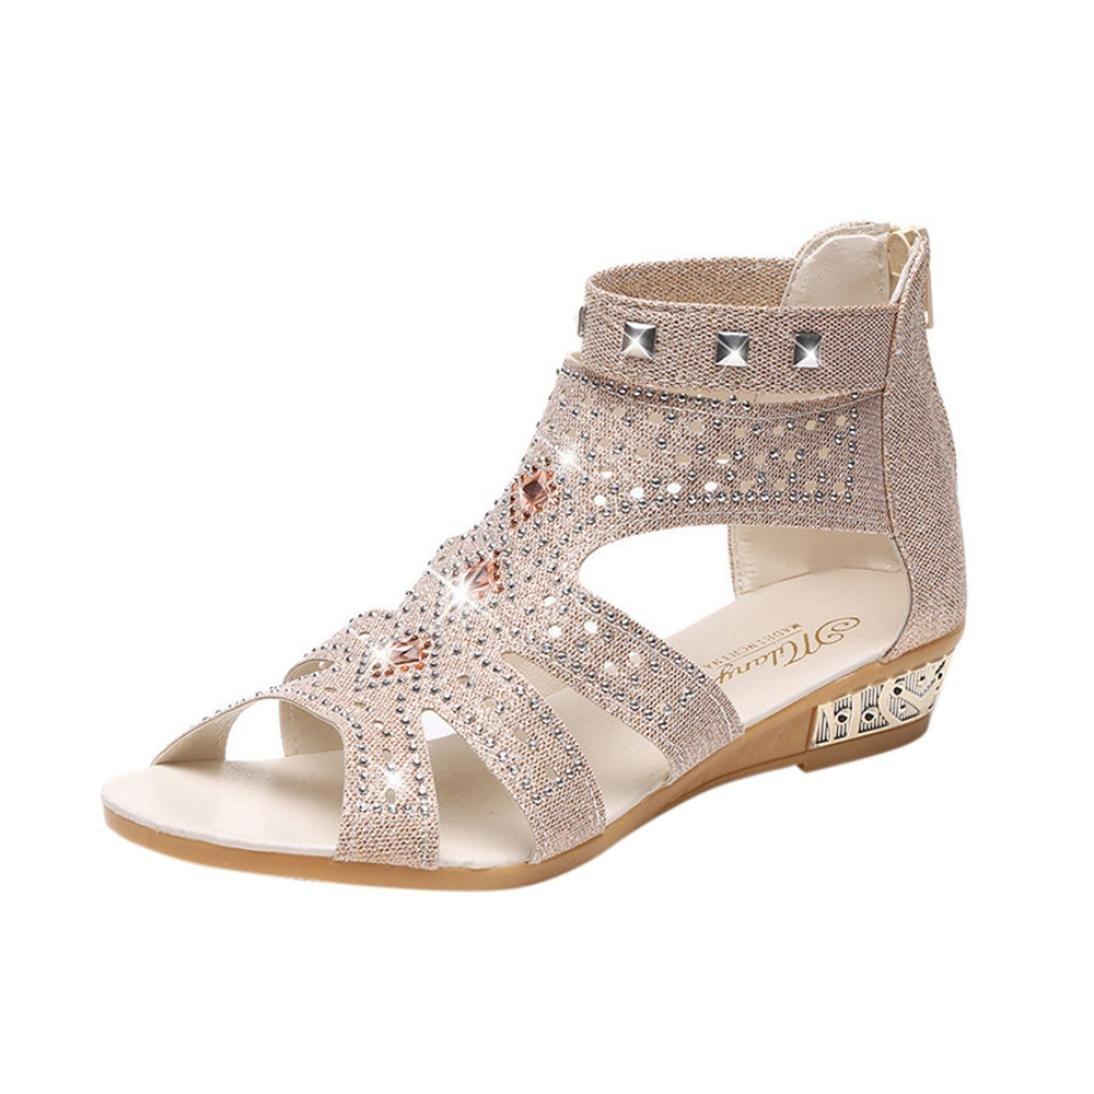 5715a63707 Gender: Women ,Womens Crisscross Summer Gladiator Braided Comfort Yoga  Strappy Flats-Sandals,Women Comfortable Summer Bohemia Sandals Clip Toe  BeachShoes ...